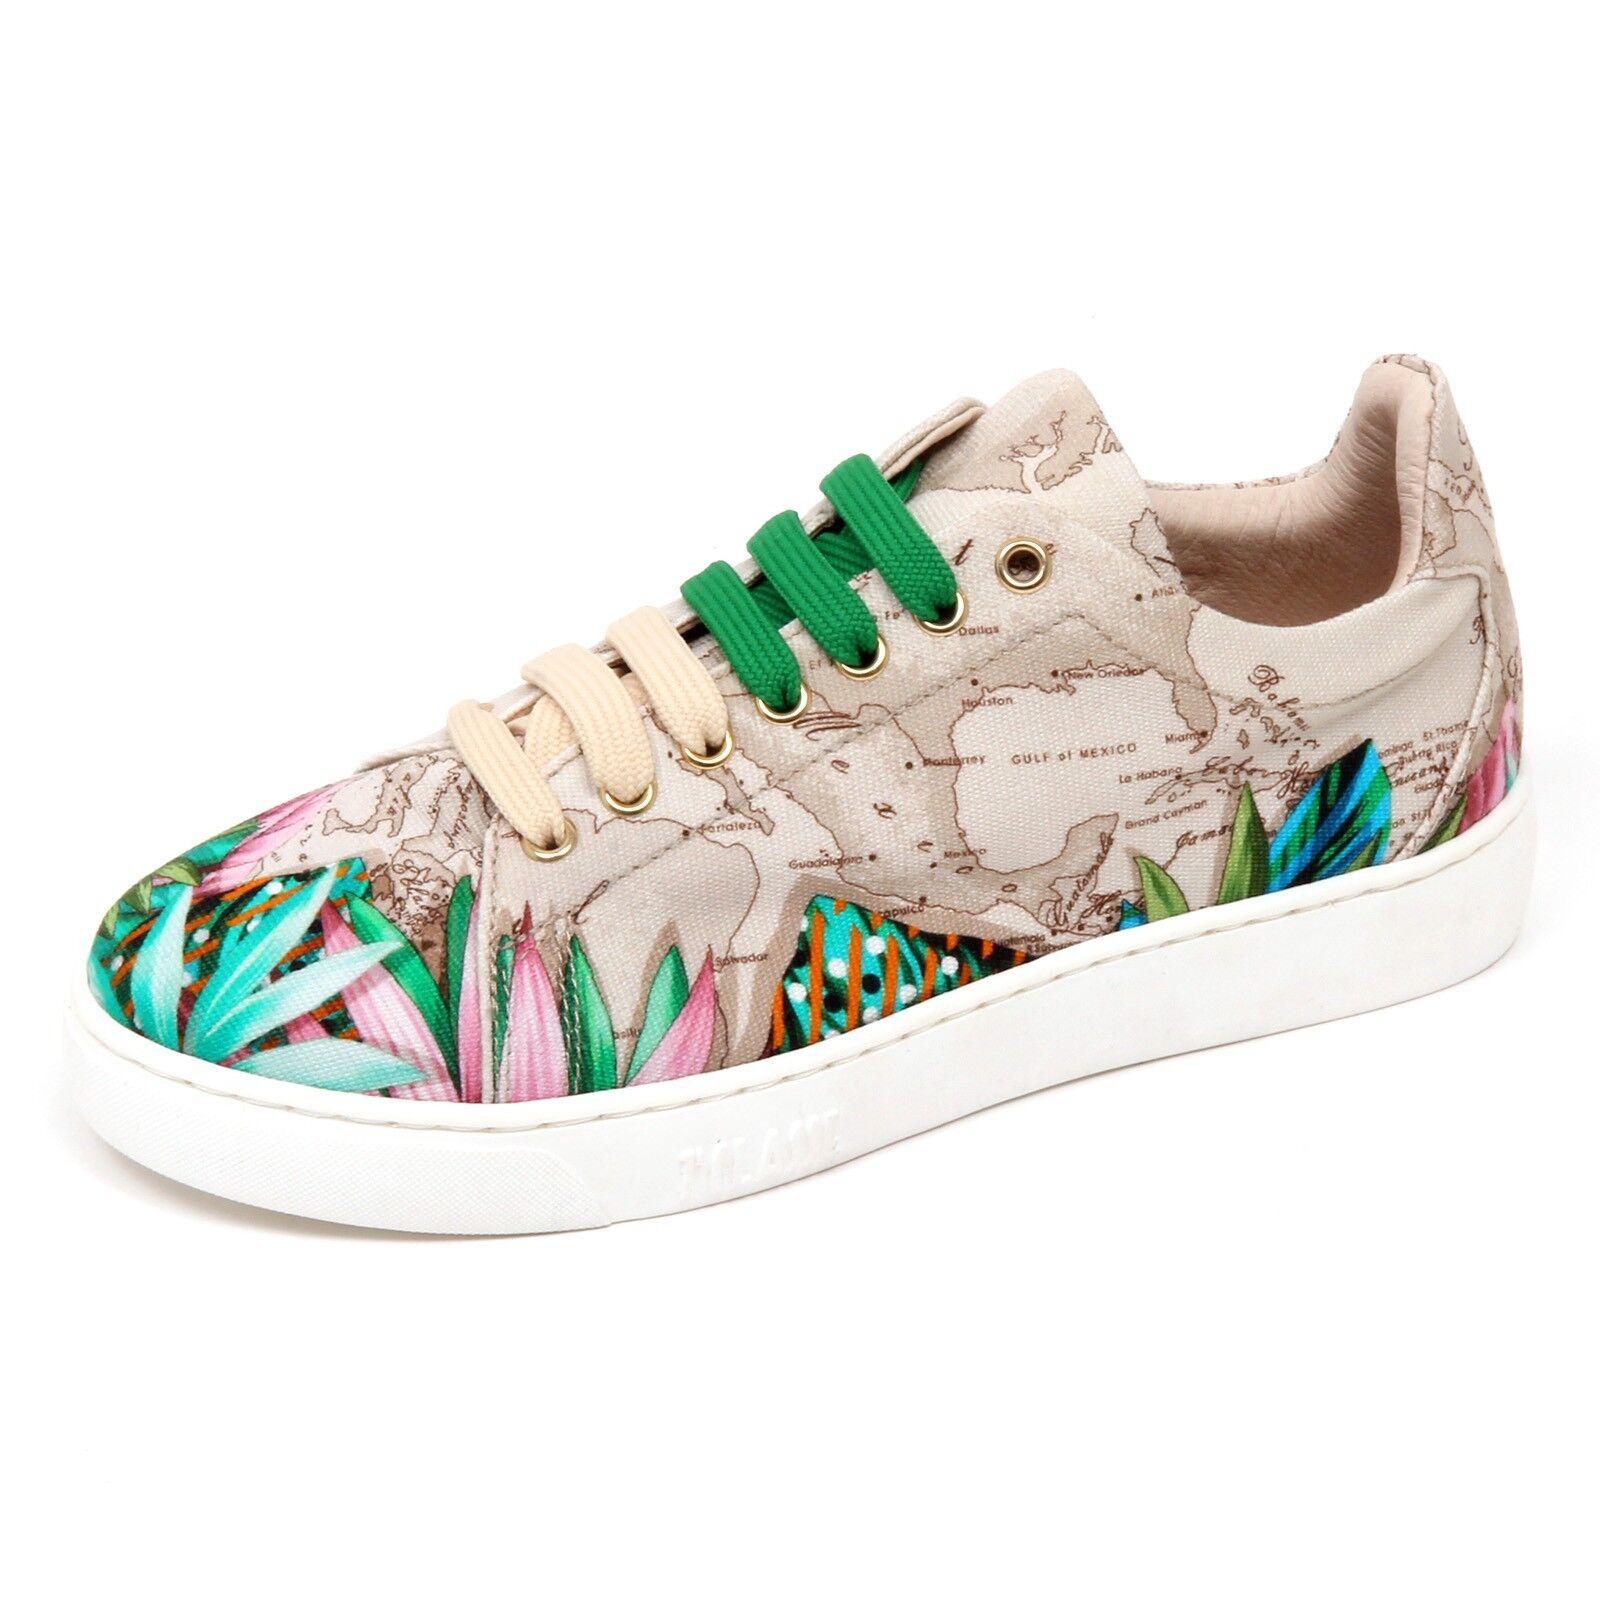 D2898 Sneaker Woman Alviero Martini 1a Class tissue shoe woman